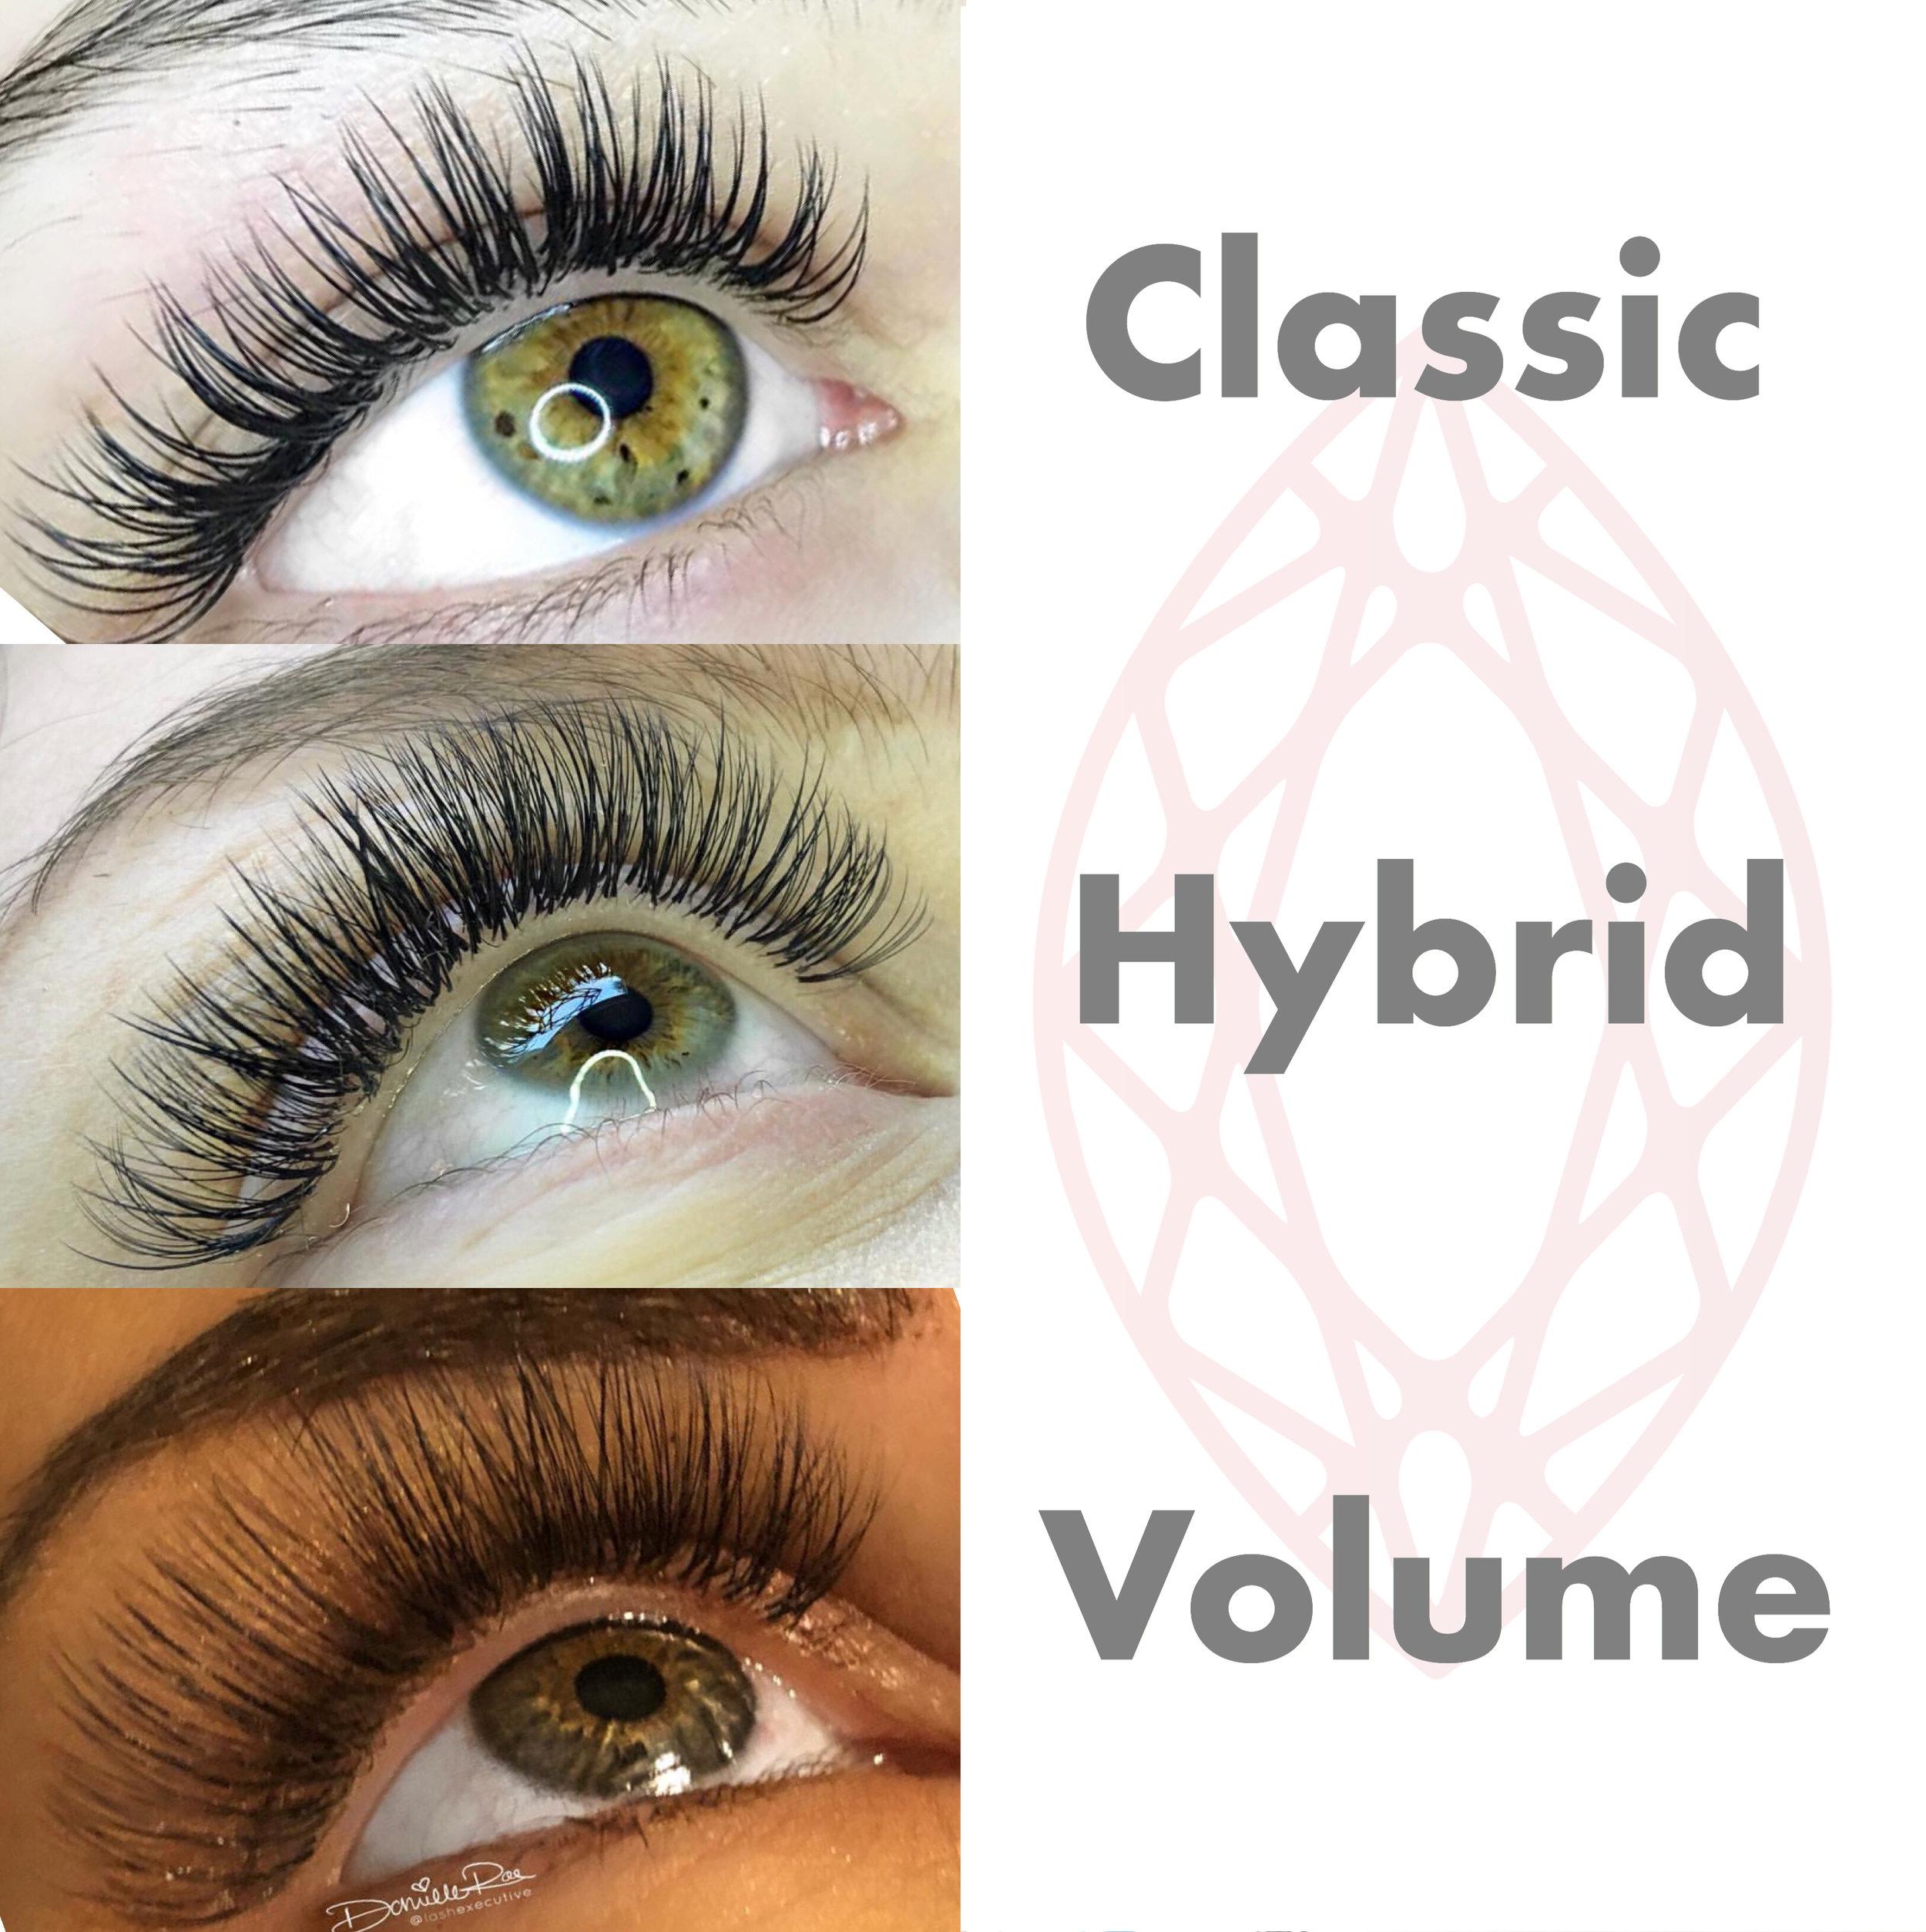 Classic Hybrid and Volume Eyelash Extensions